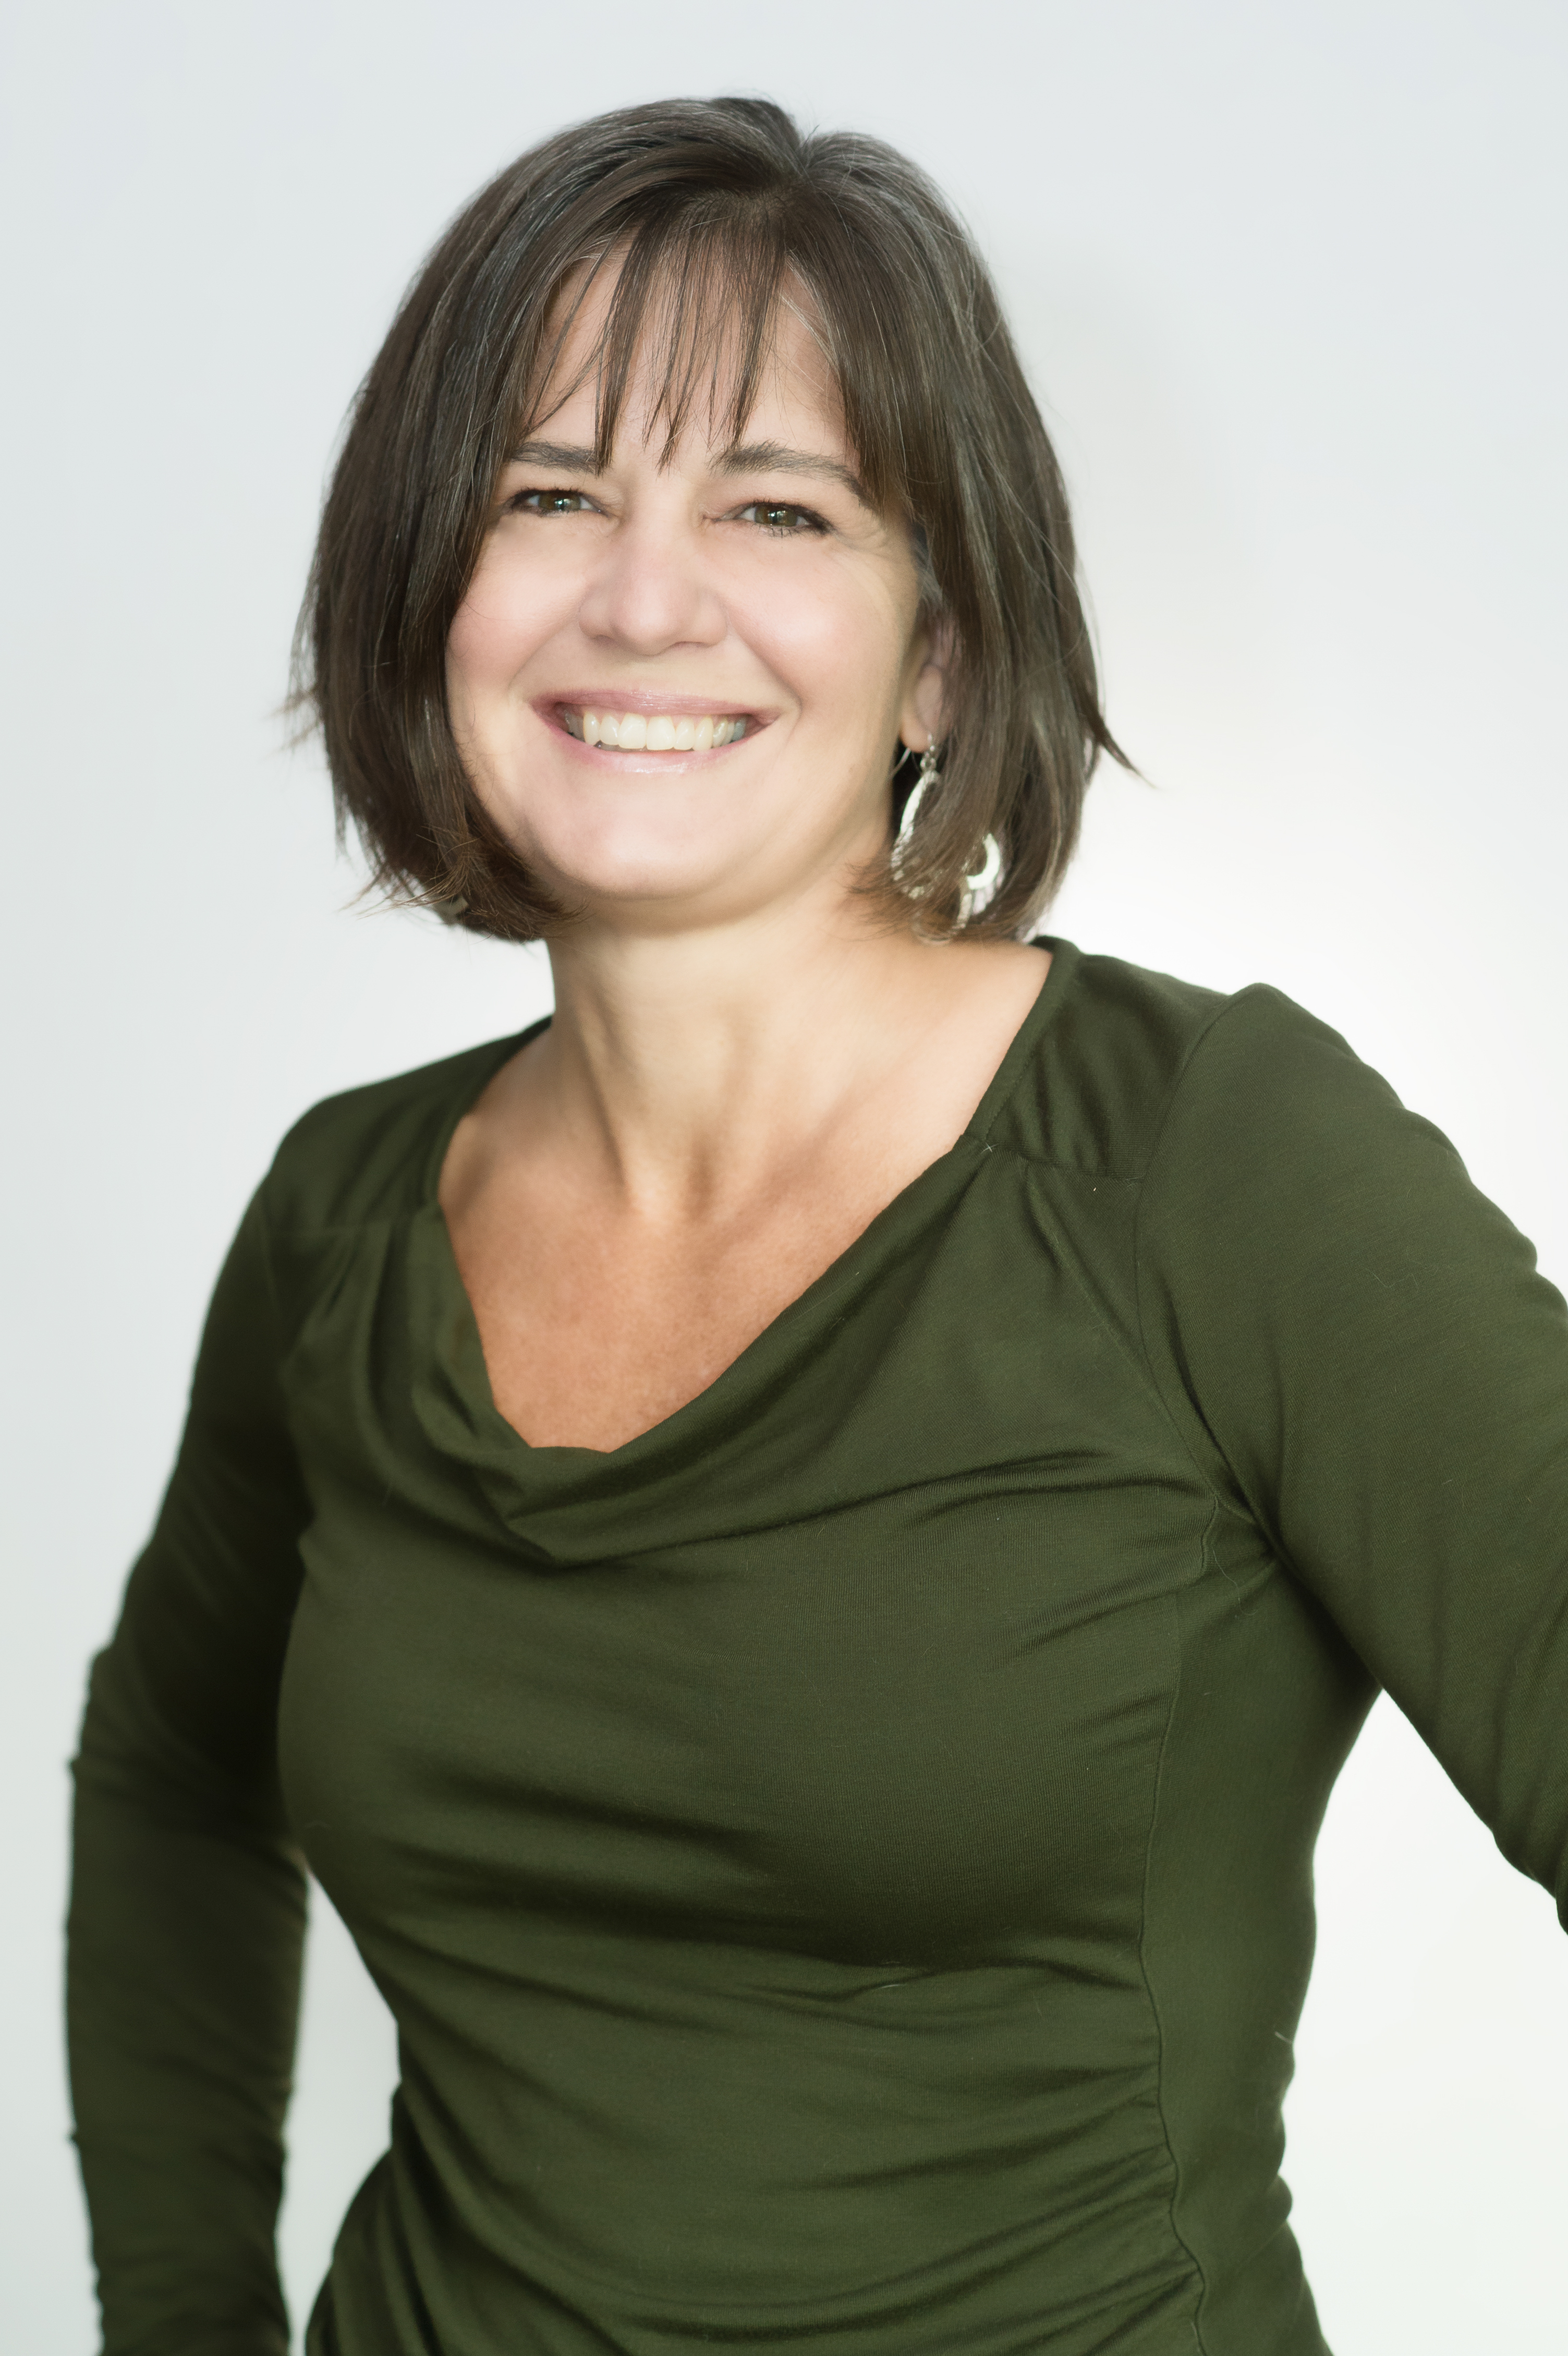 Wendy Gustafson